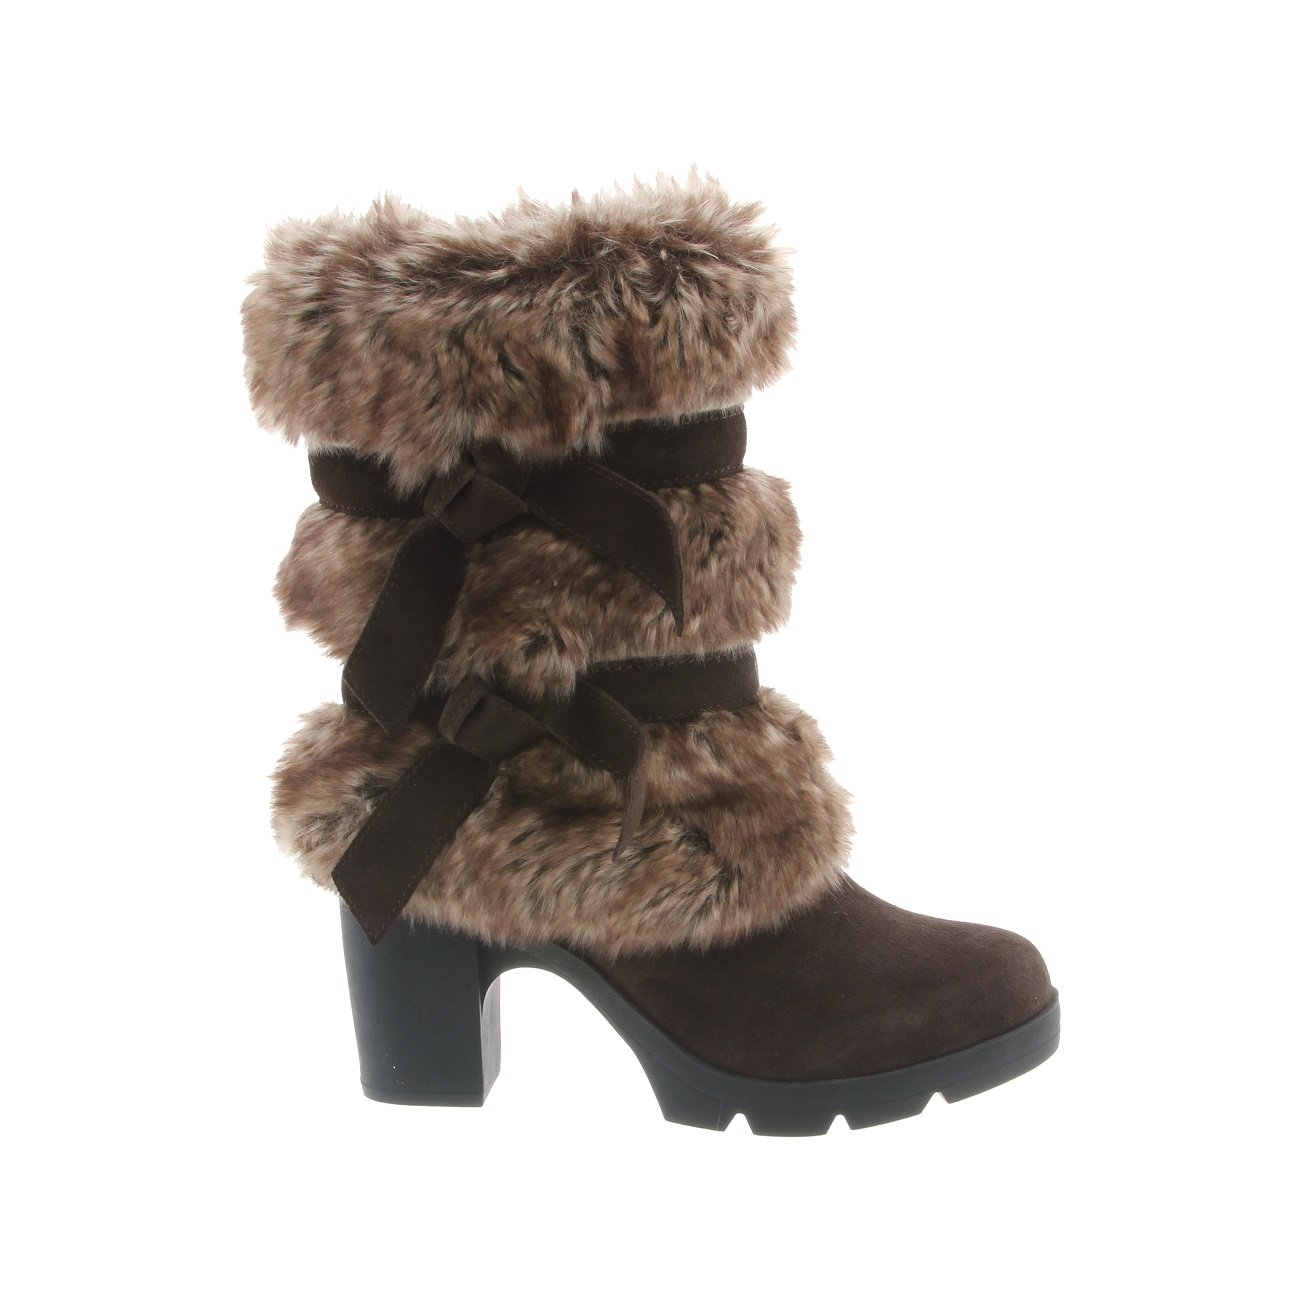 BEARPAW Bridget Women's Boot B06Y13NM6S 6 B(M) US|Chocolate Ii